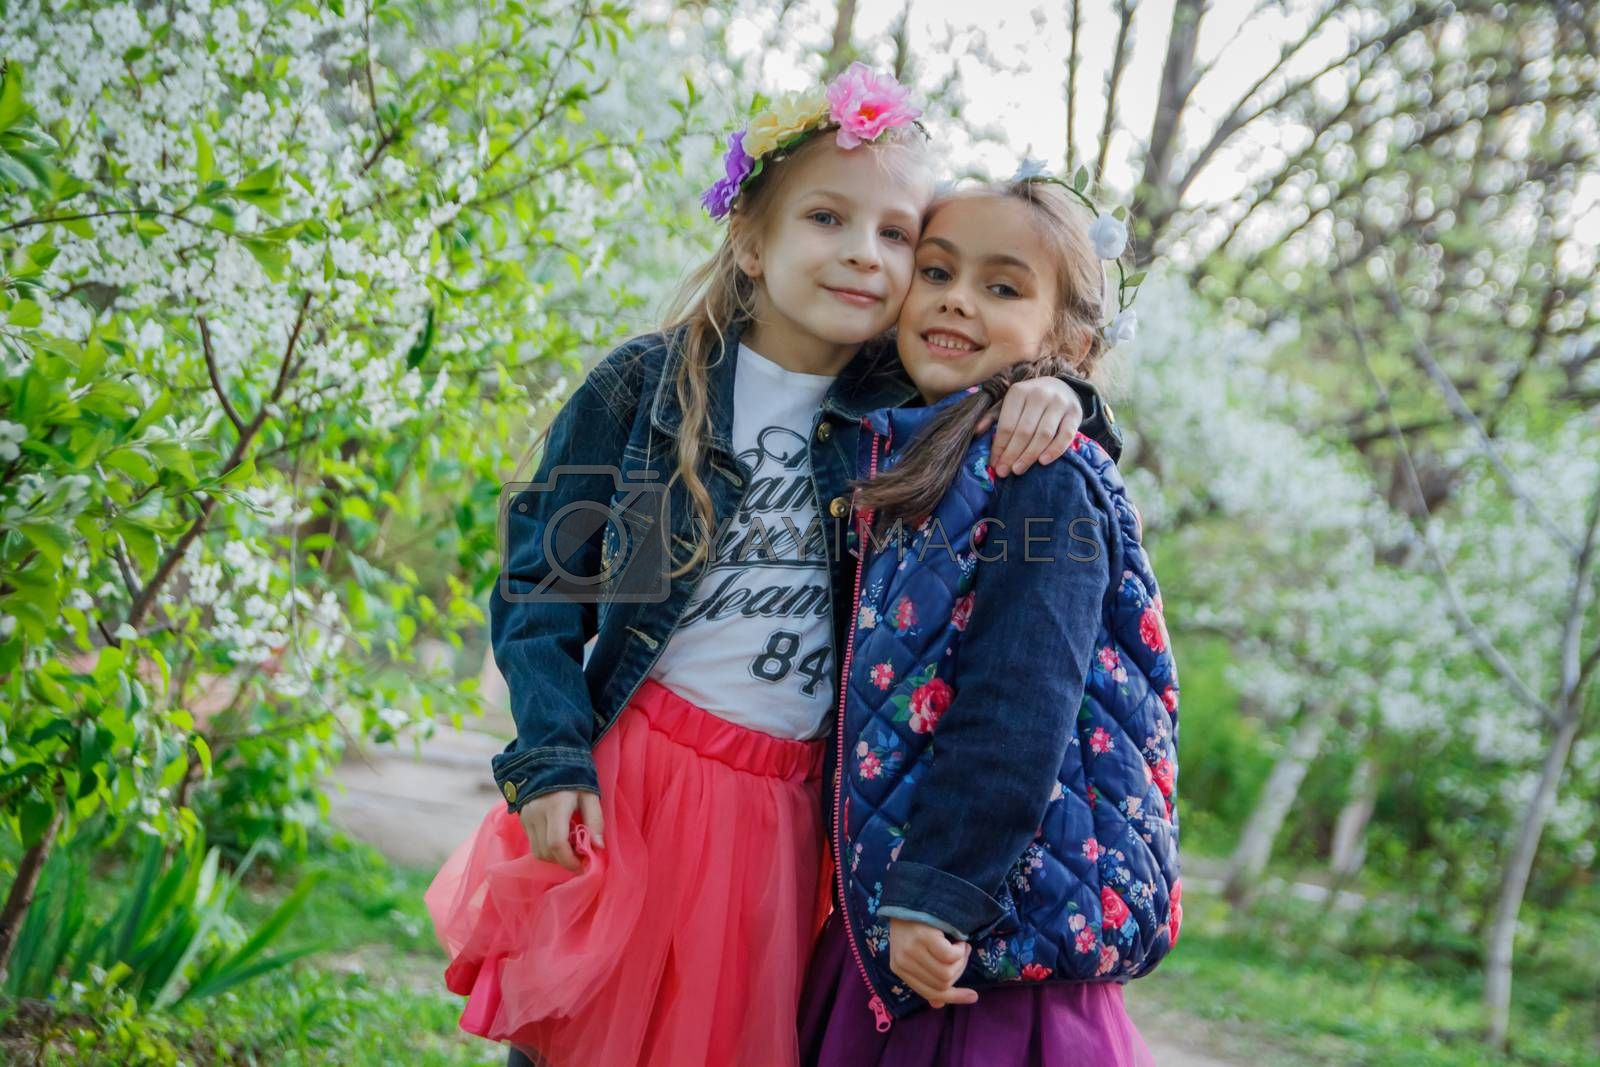 Two happy girls enjoying spring garden